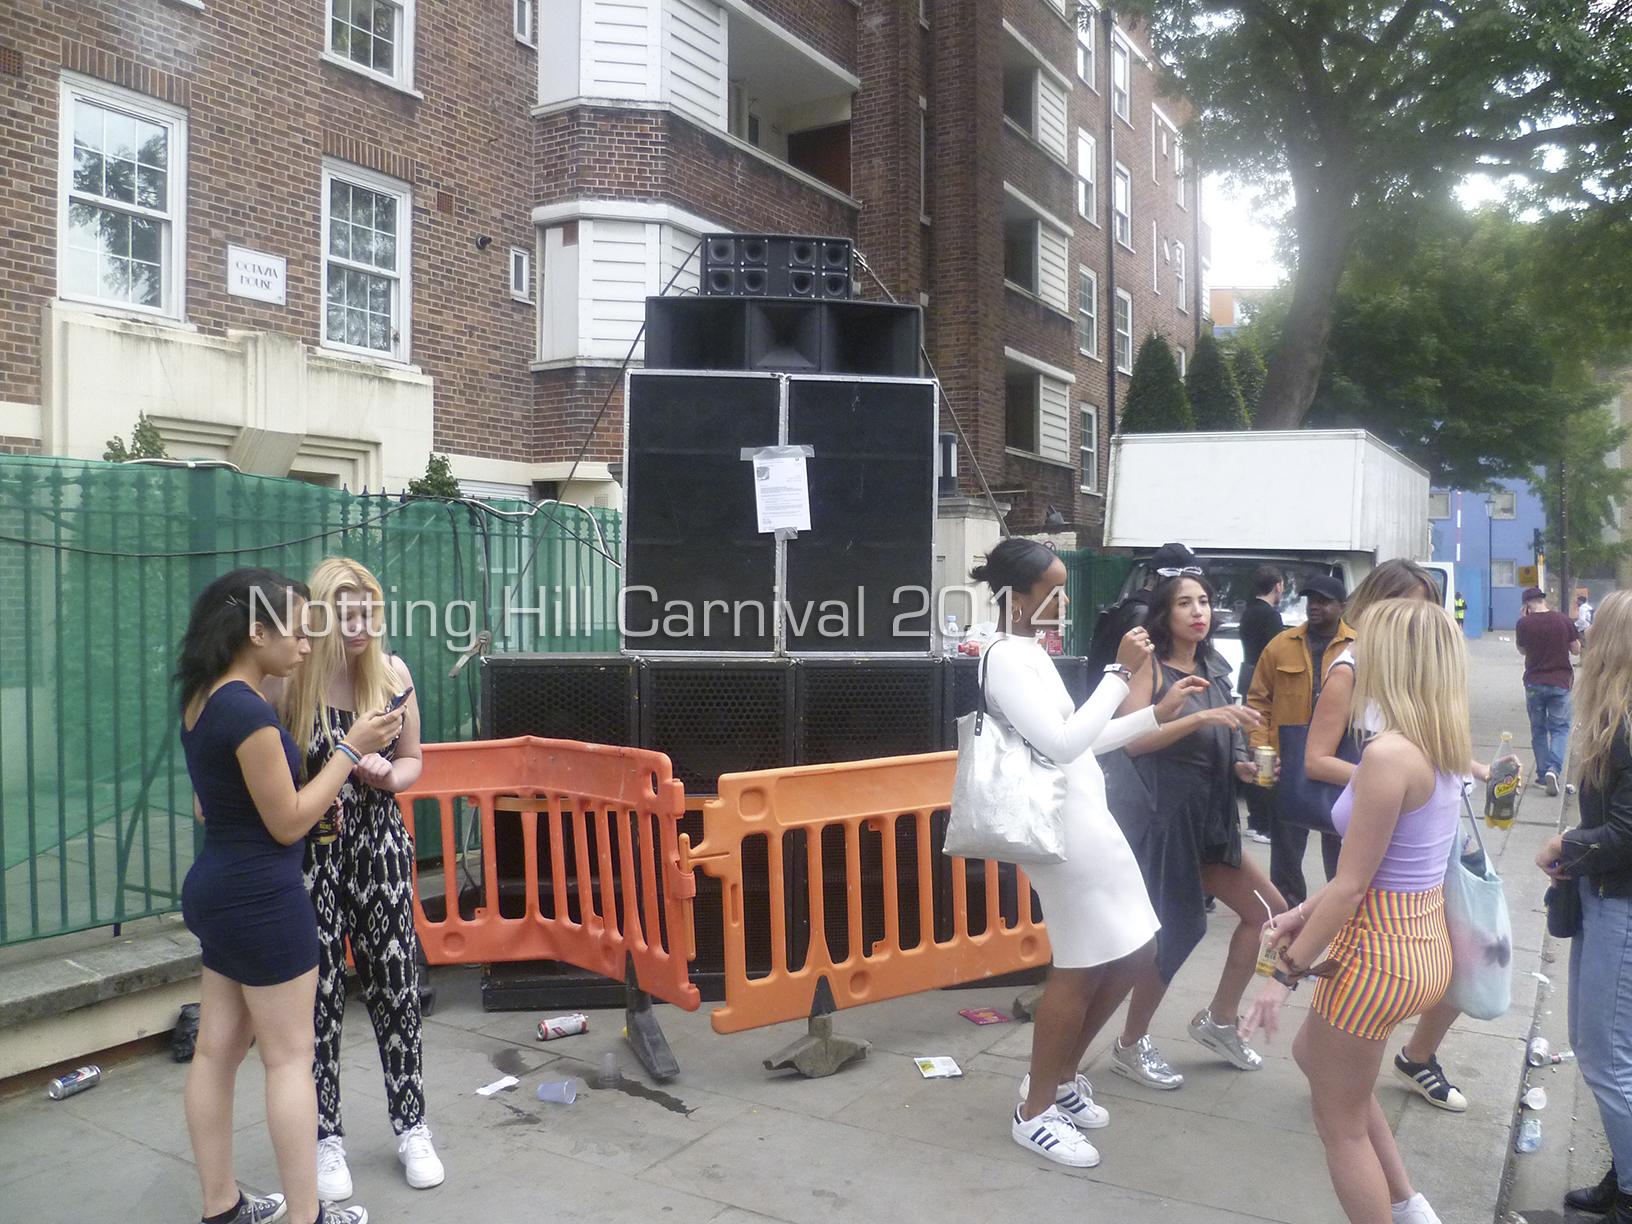 Notting-Hill-Carnival-2014-Street-Sound-System-26